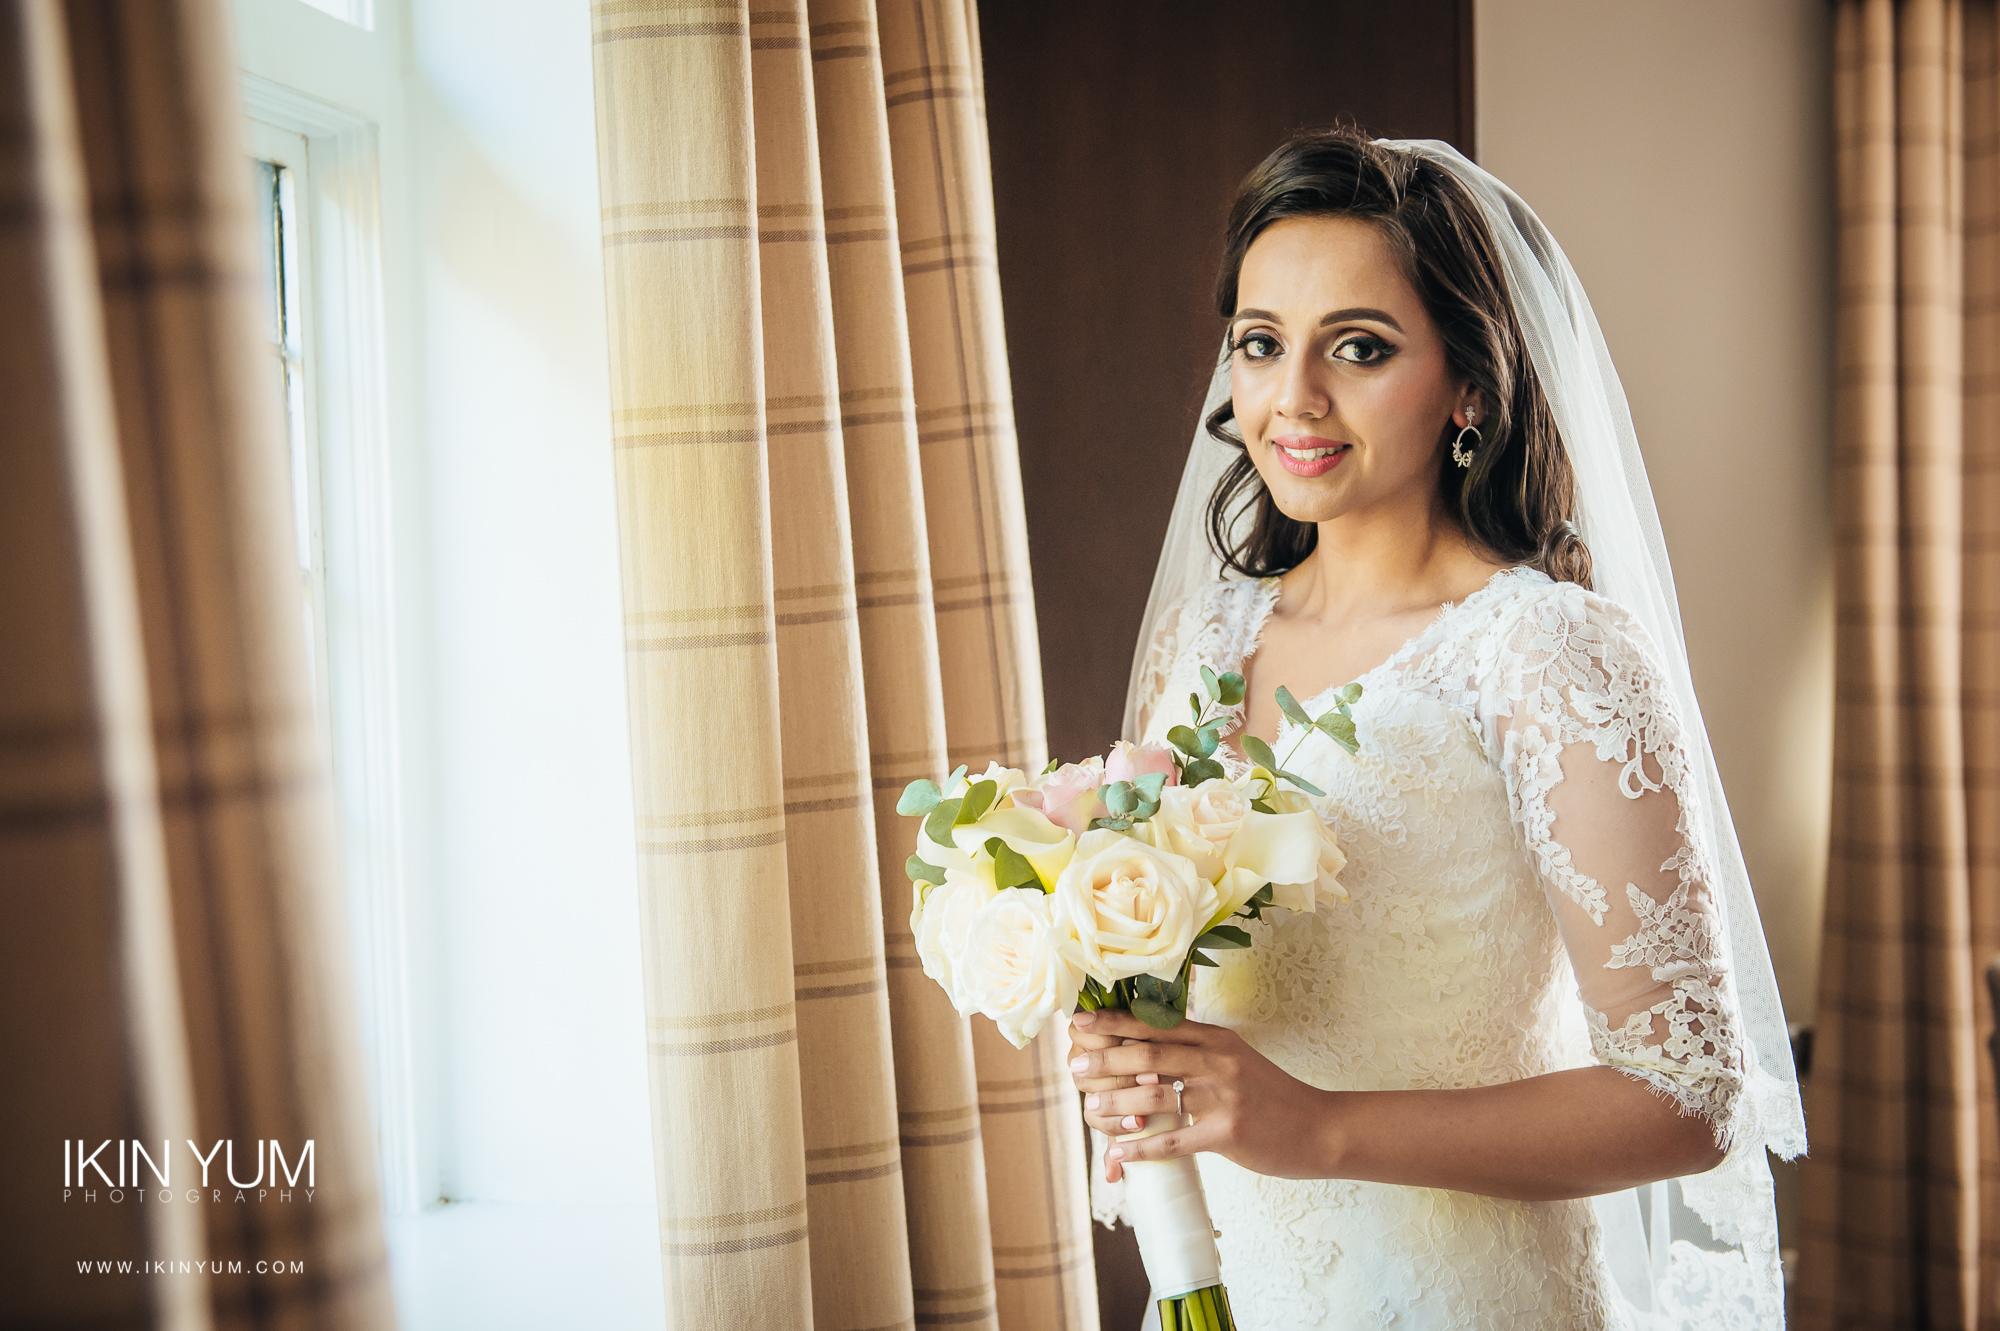 Laura Ashley Manor Wedding - Ikin Yum Photography-029.jpg